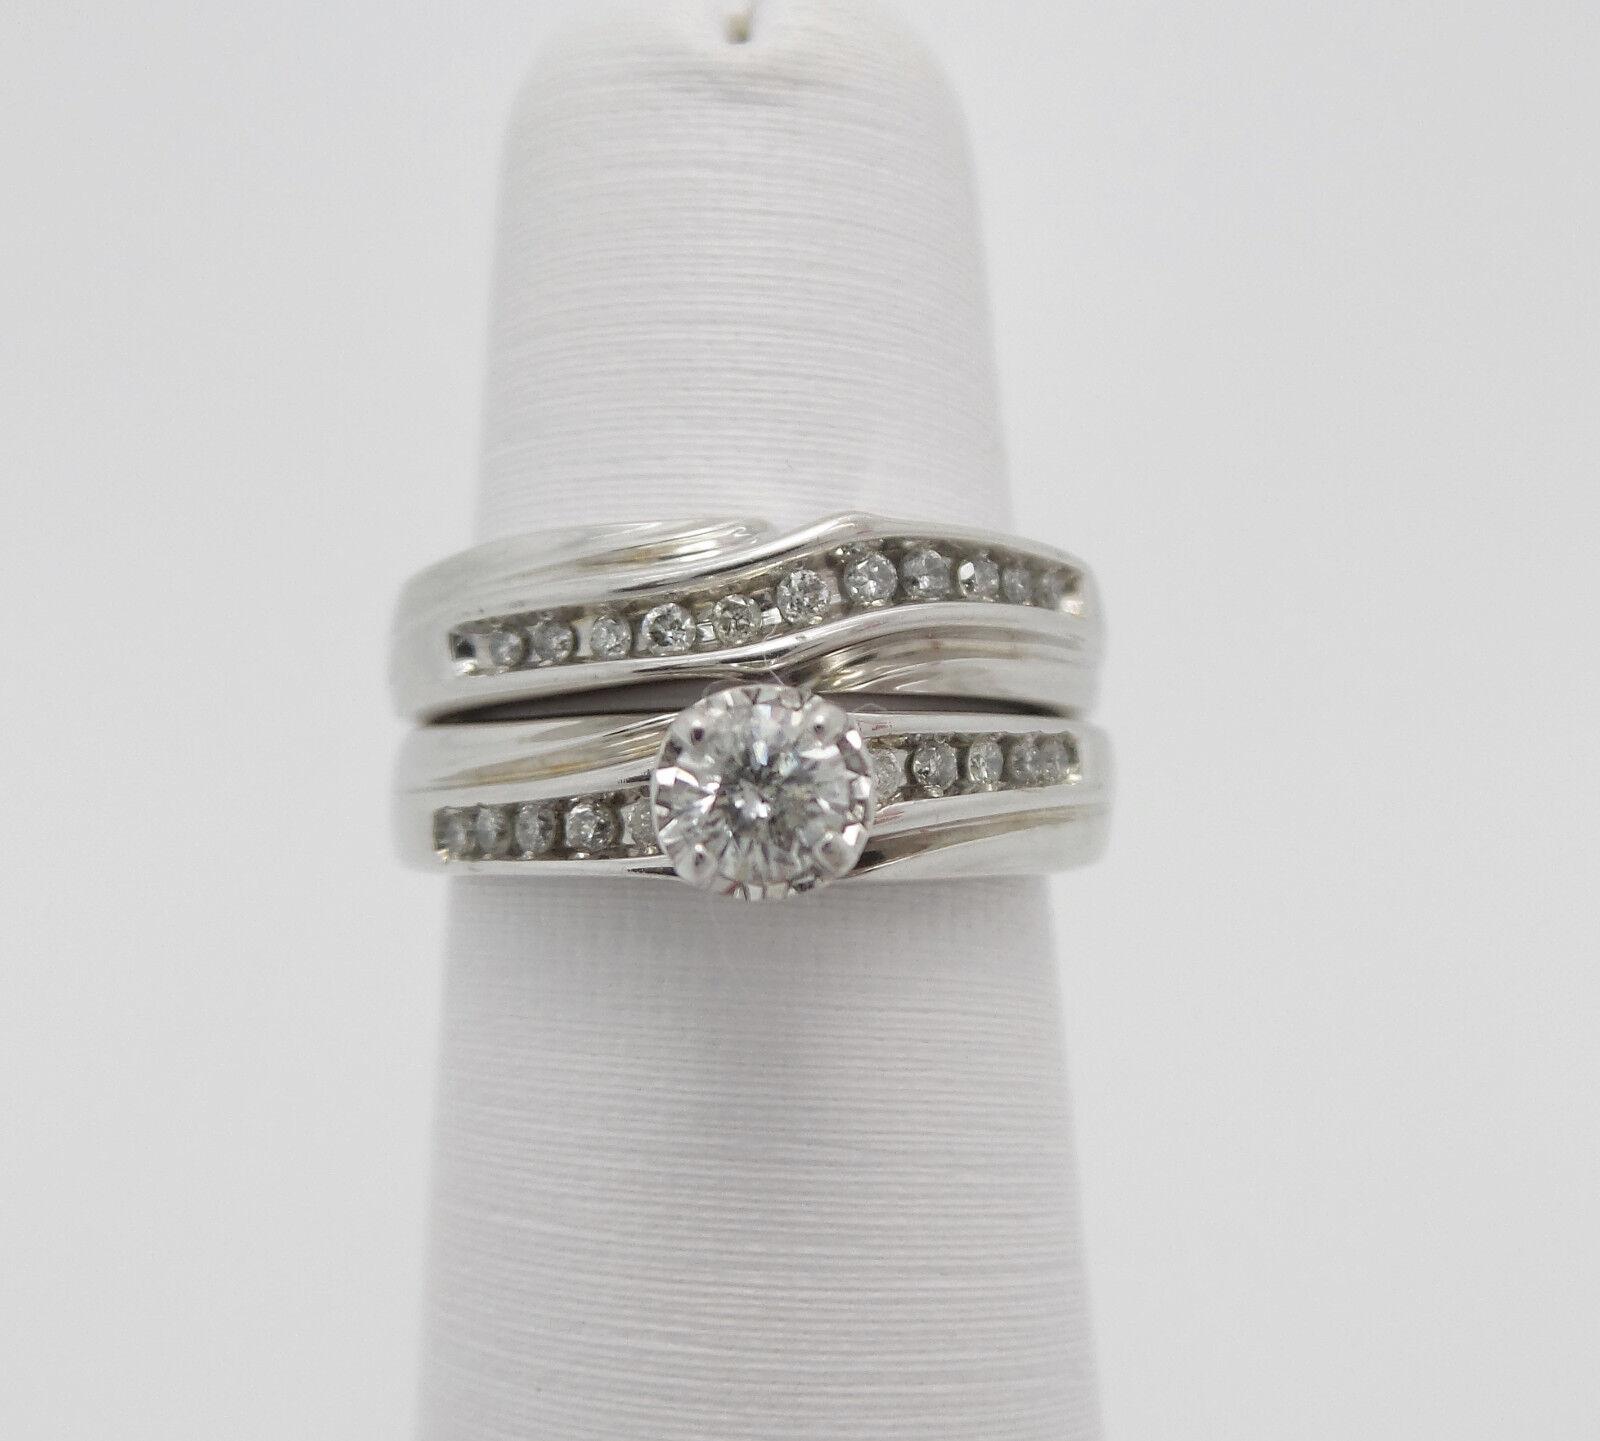 Zales 5 8CT Diamond Engagement Wedding Ring Set 14K White Gold Bridal Set